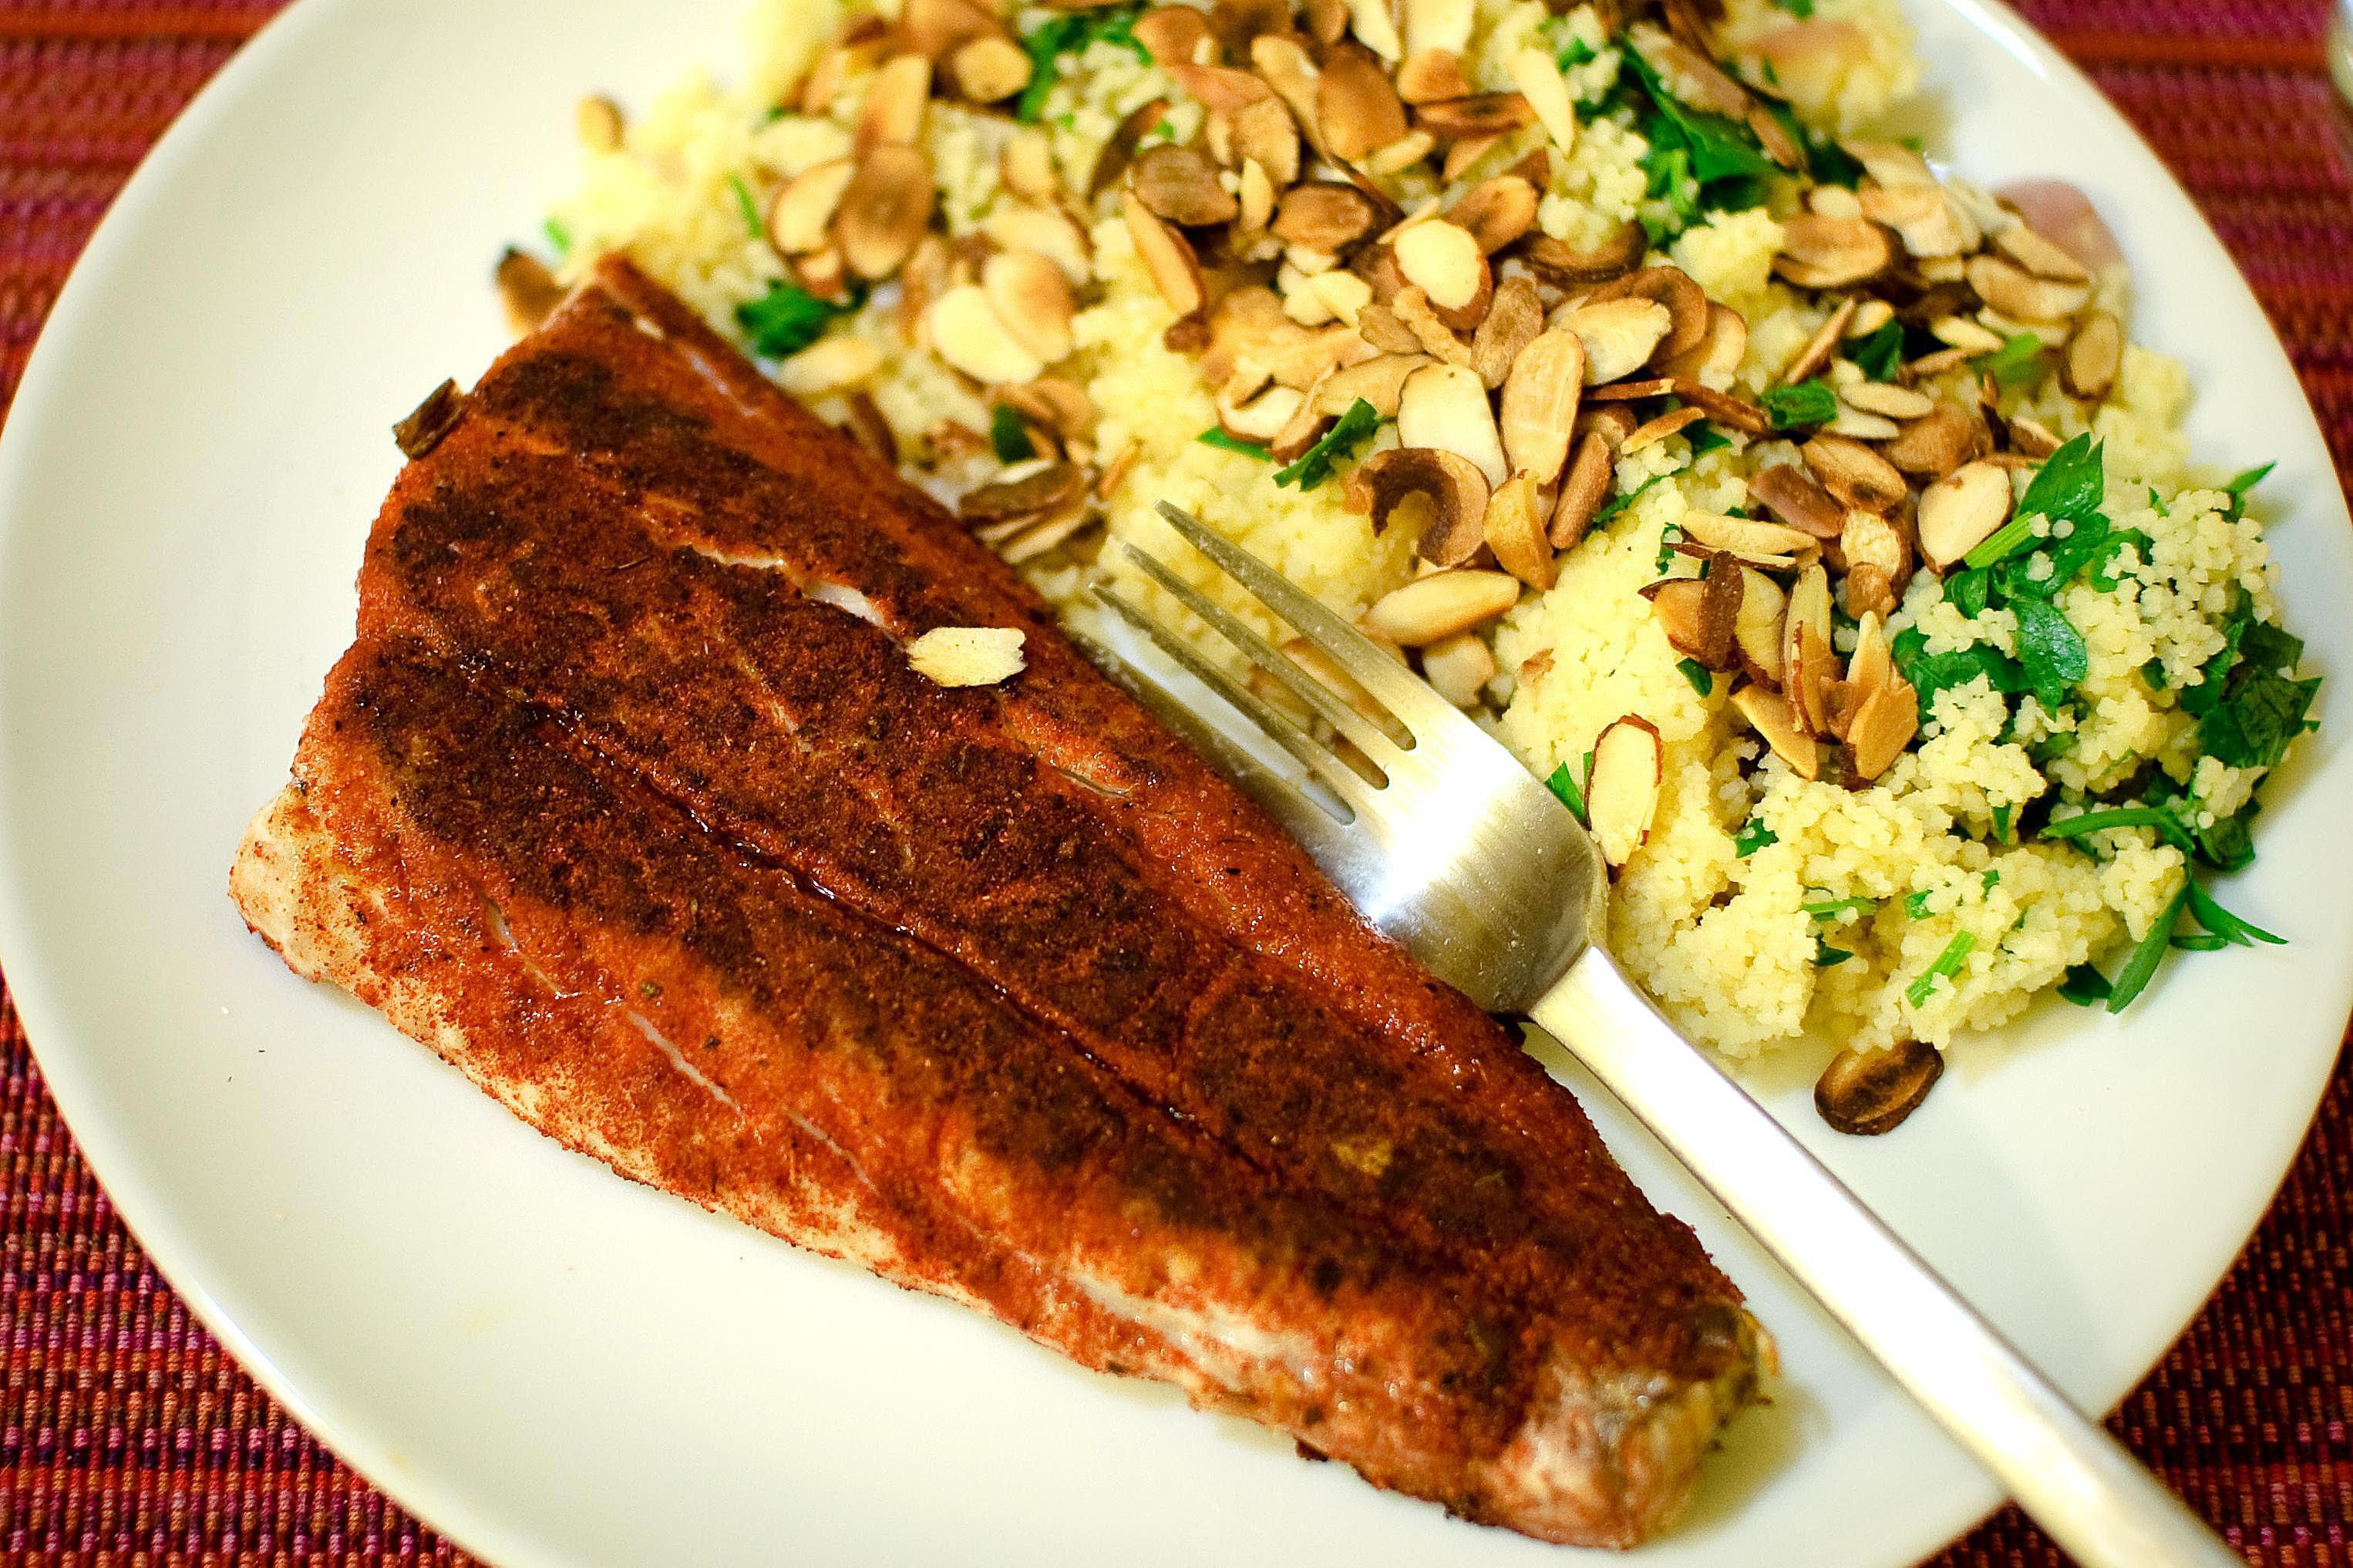 Cajun blackening spice for fish recipe for Blackening spice for fish